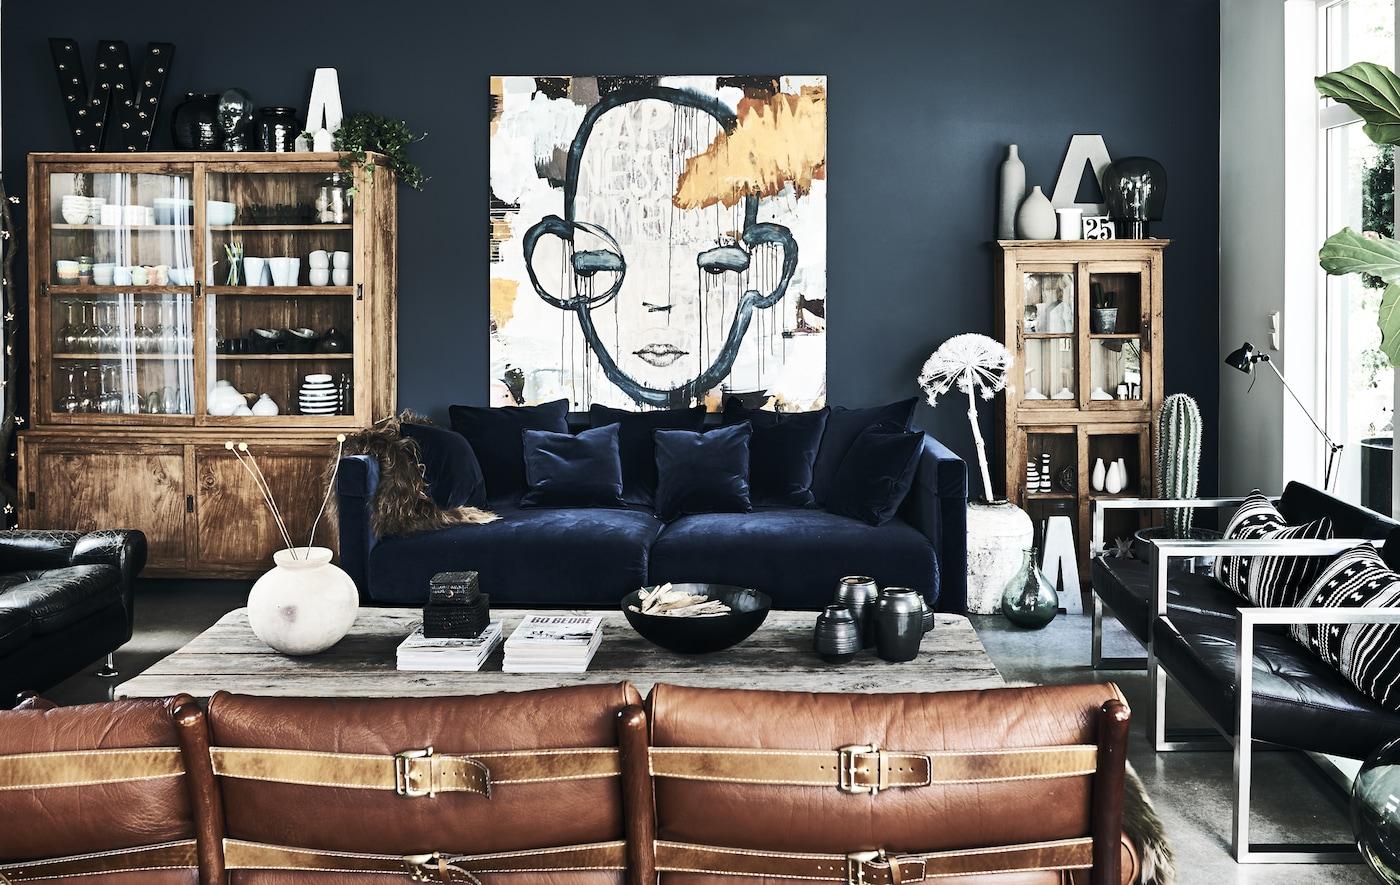 Divano Velluto Blu Ikea una casa in norvegia ispirata alla natura - ikea svizzera